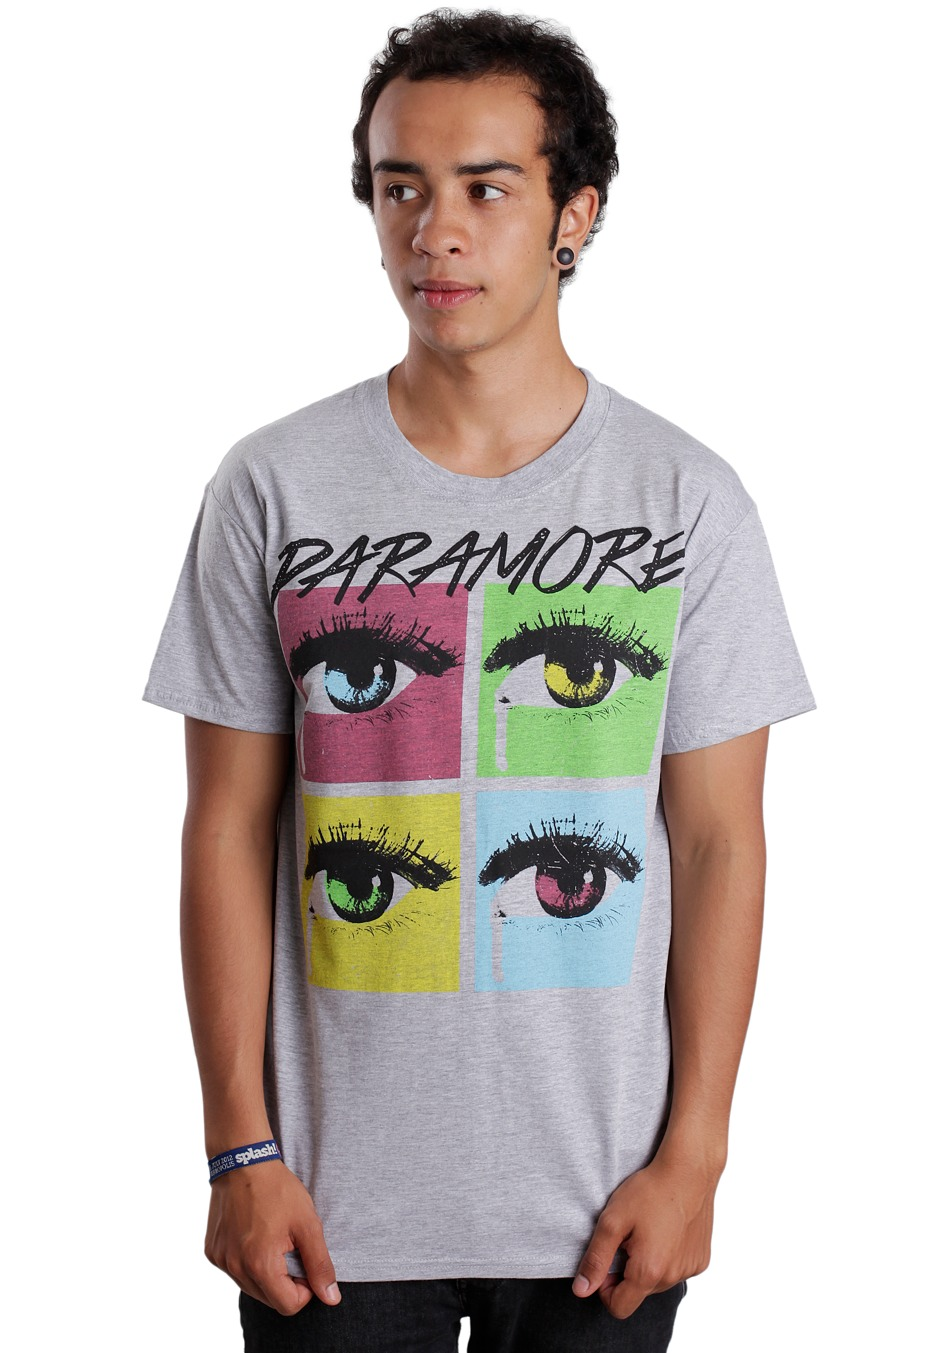 Paramore - Pop Tear Grey - T-Shirt - Official Pop Punk ... Paramore Nederland